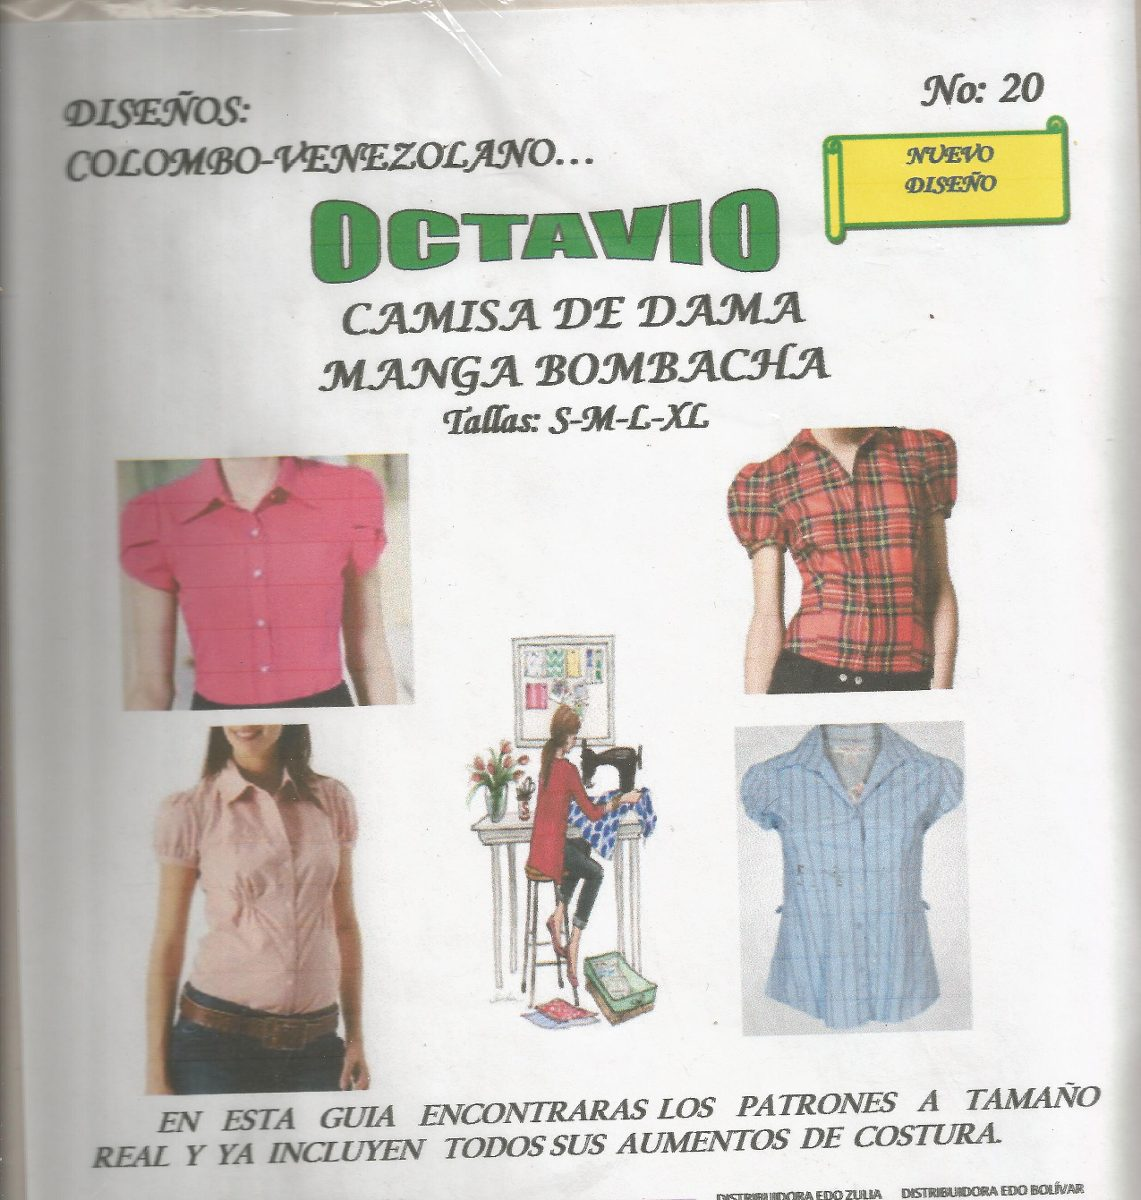 Patrones Octavio Camisa Dama Manga Bombacha #20 - Bs. 2.000,04 en ...